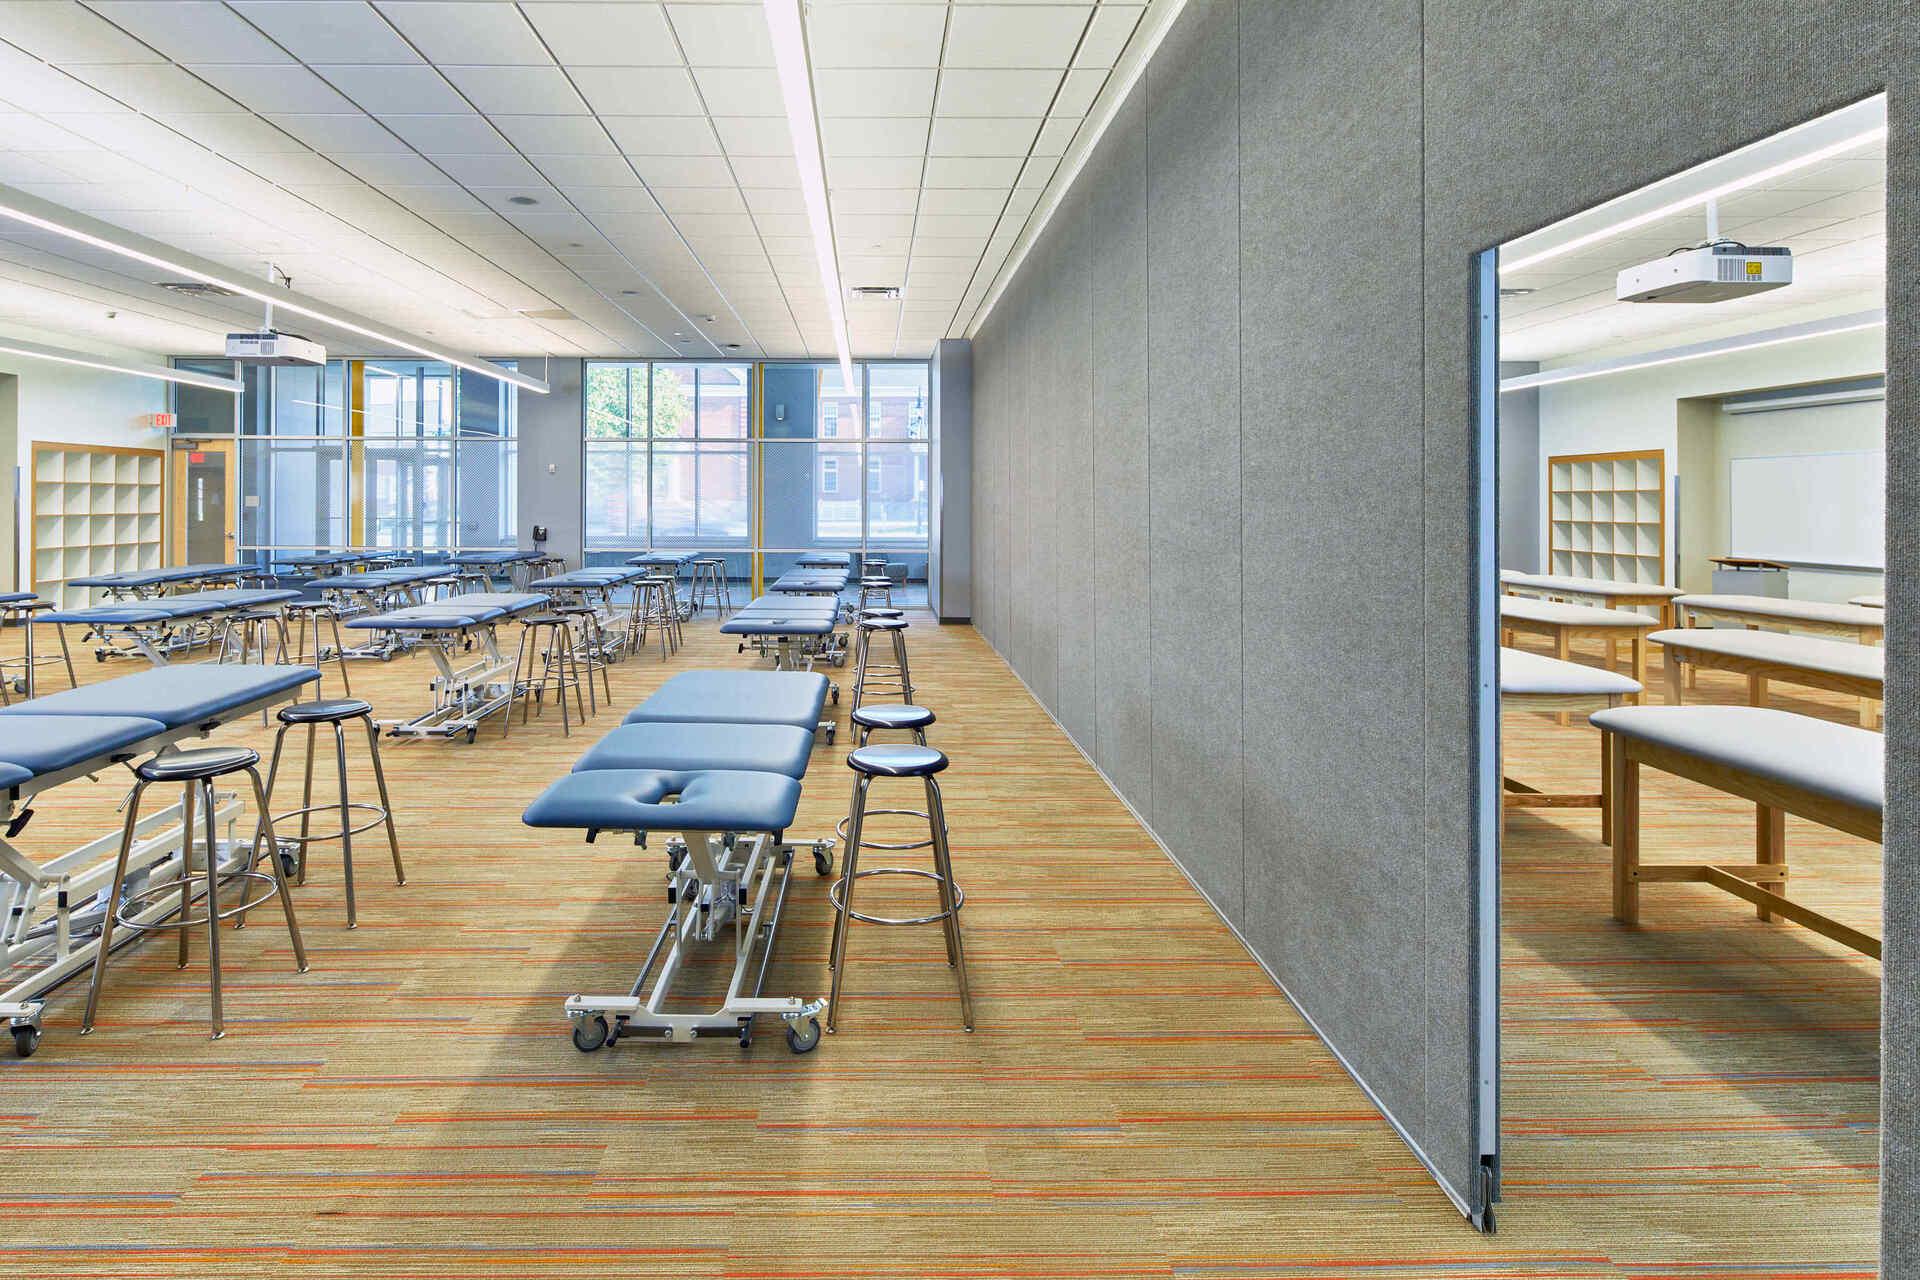 American International College, Springfield, MA. Architects & Design-Build Firm: Phase Zero Design.